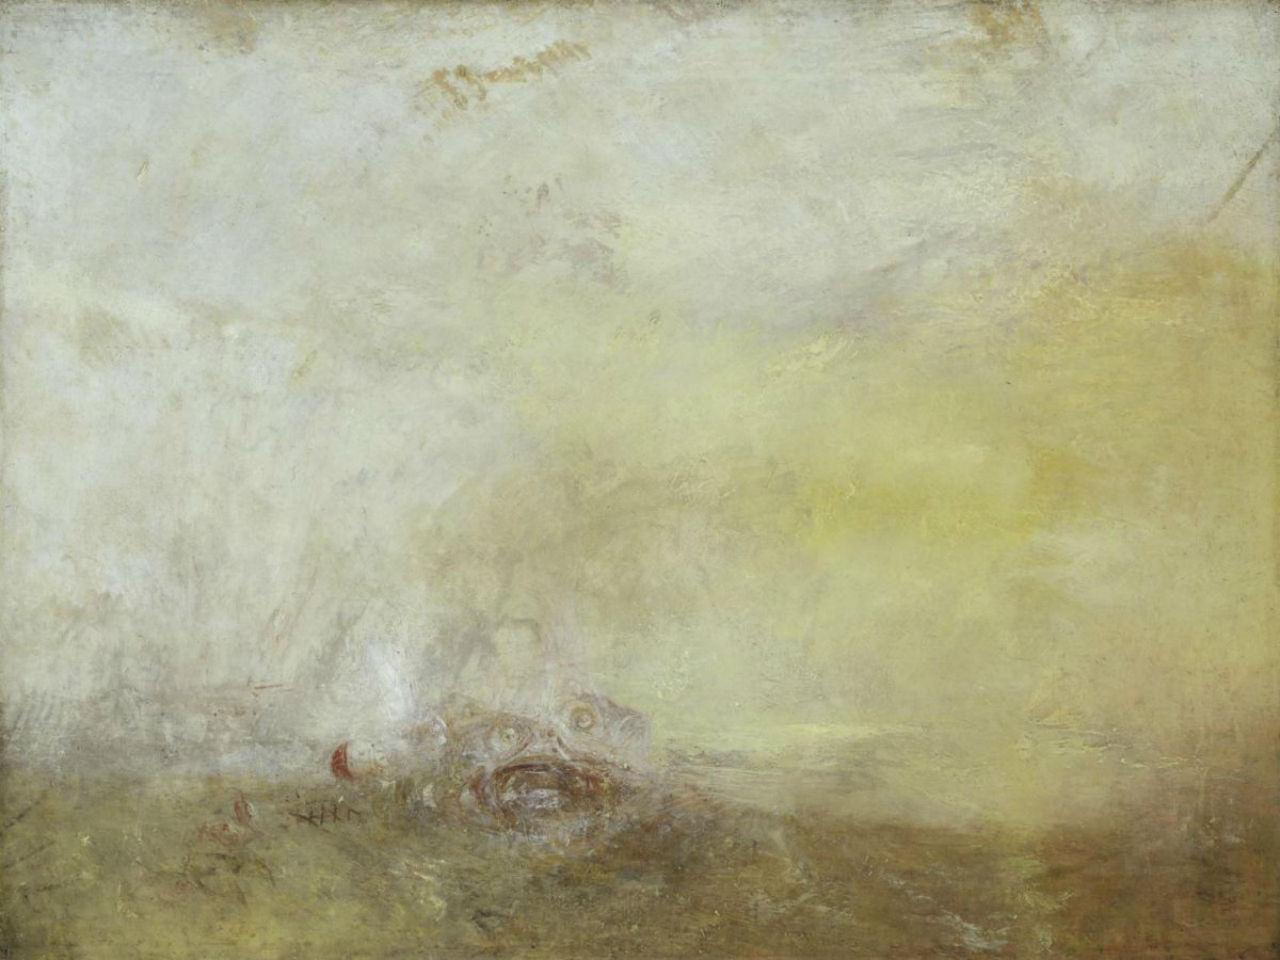 6-Джозеф Мэллорд Уильям Тёрнер - Восход солнца с морскими чудовищами - 1845.jpg